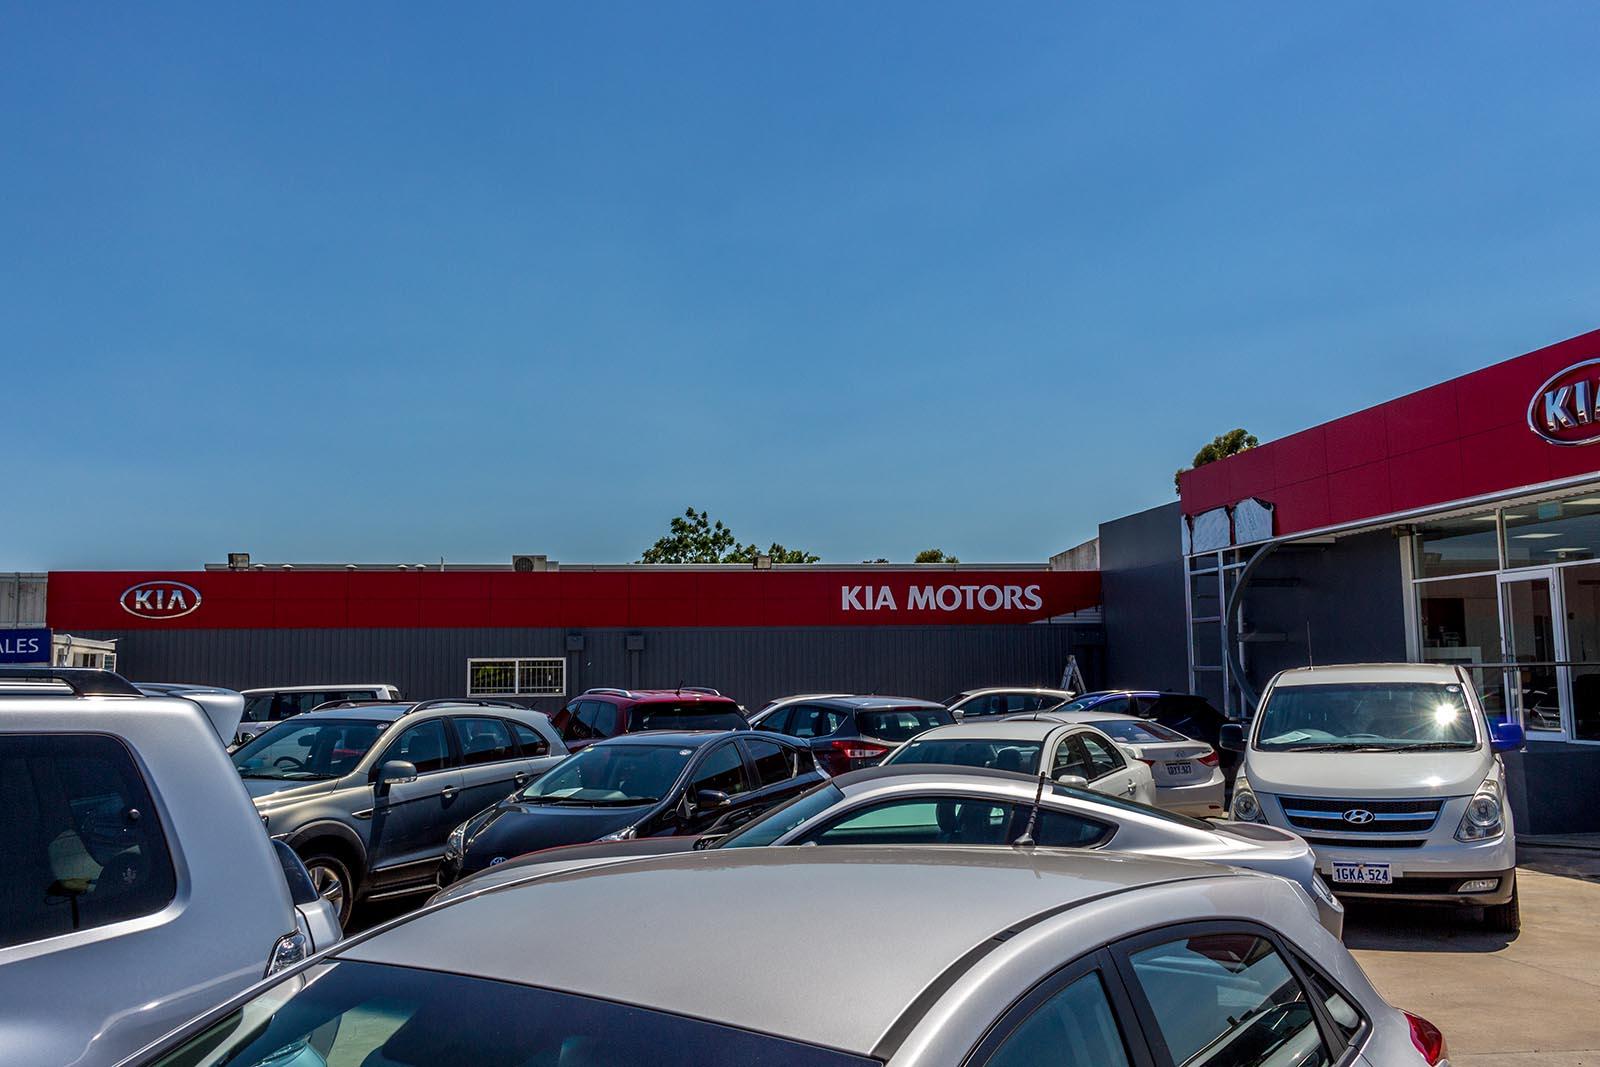 acm cladding at Kia Motors Midland by compac | perth signs